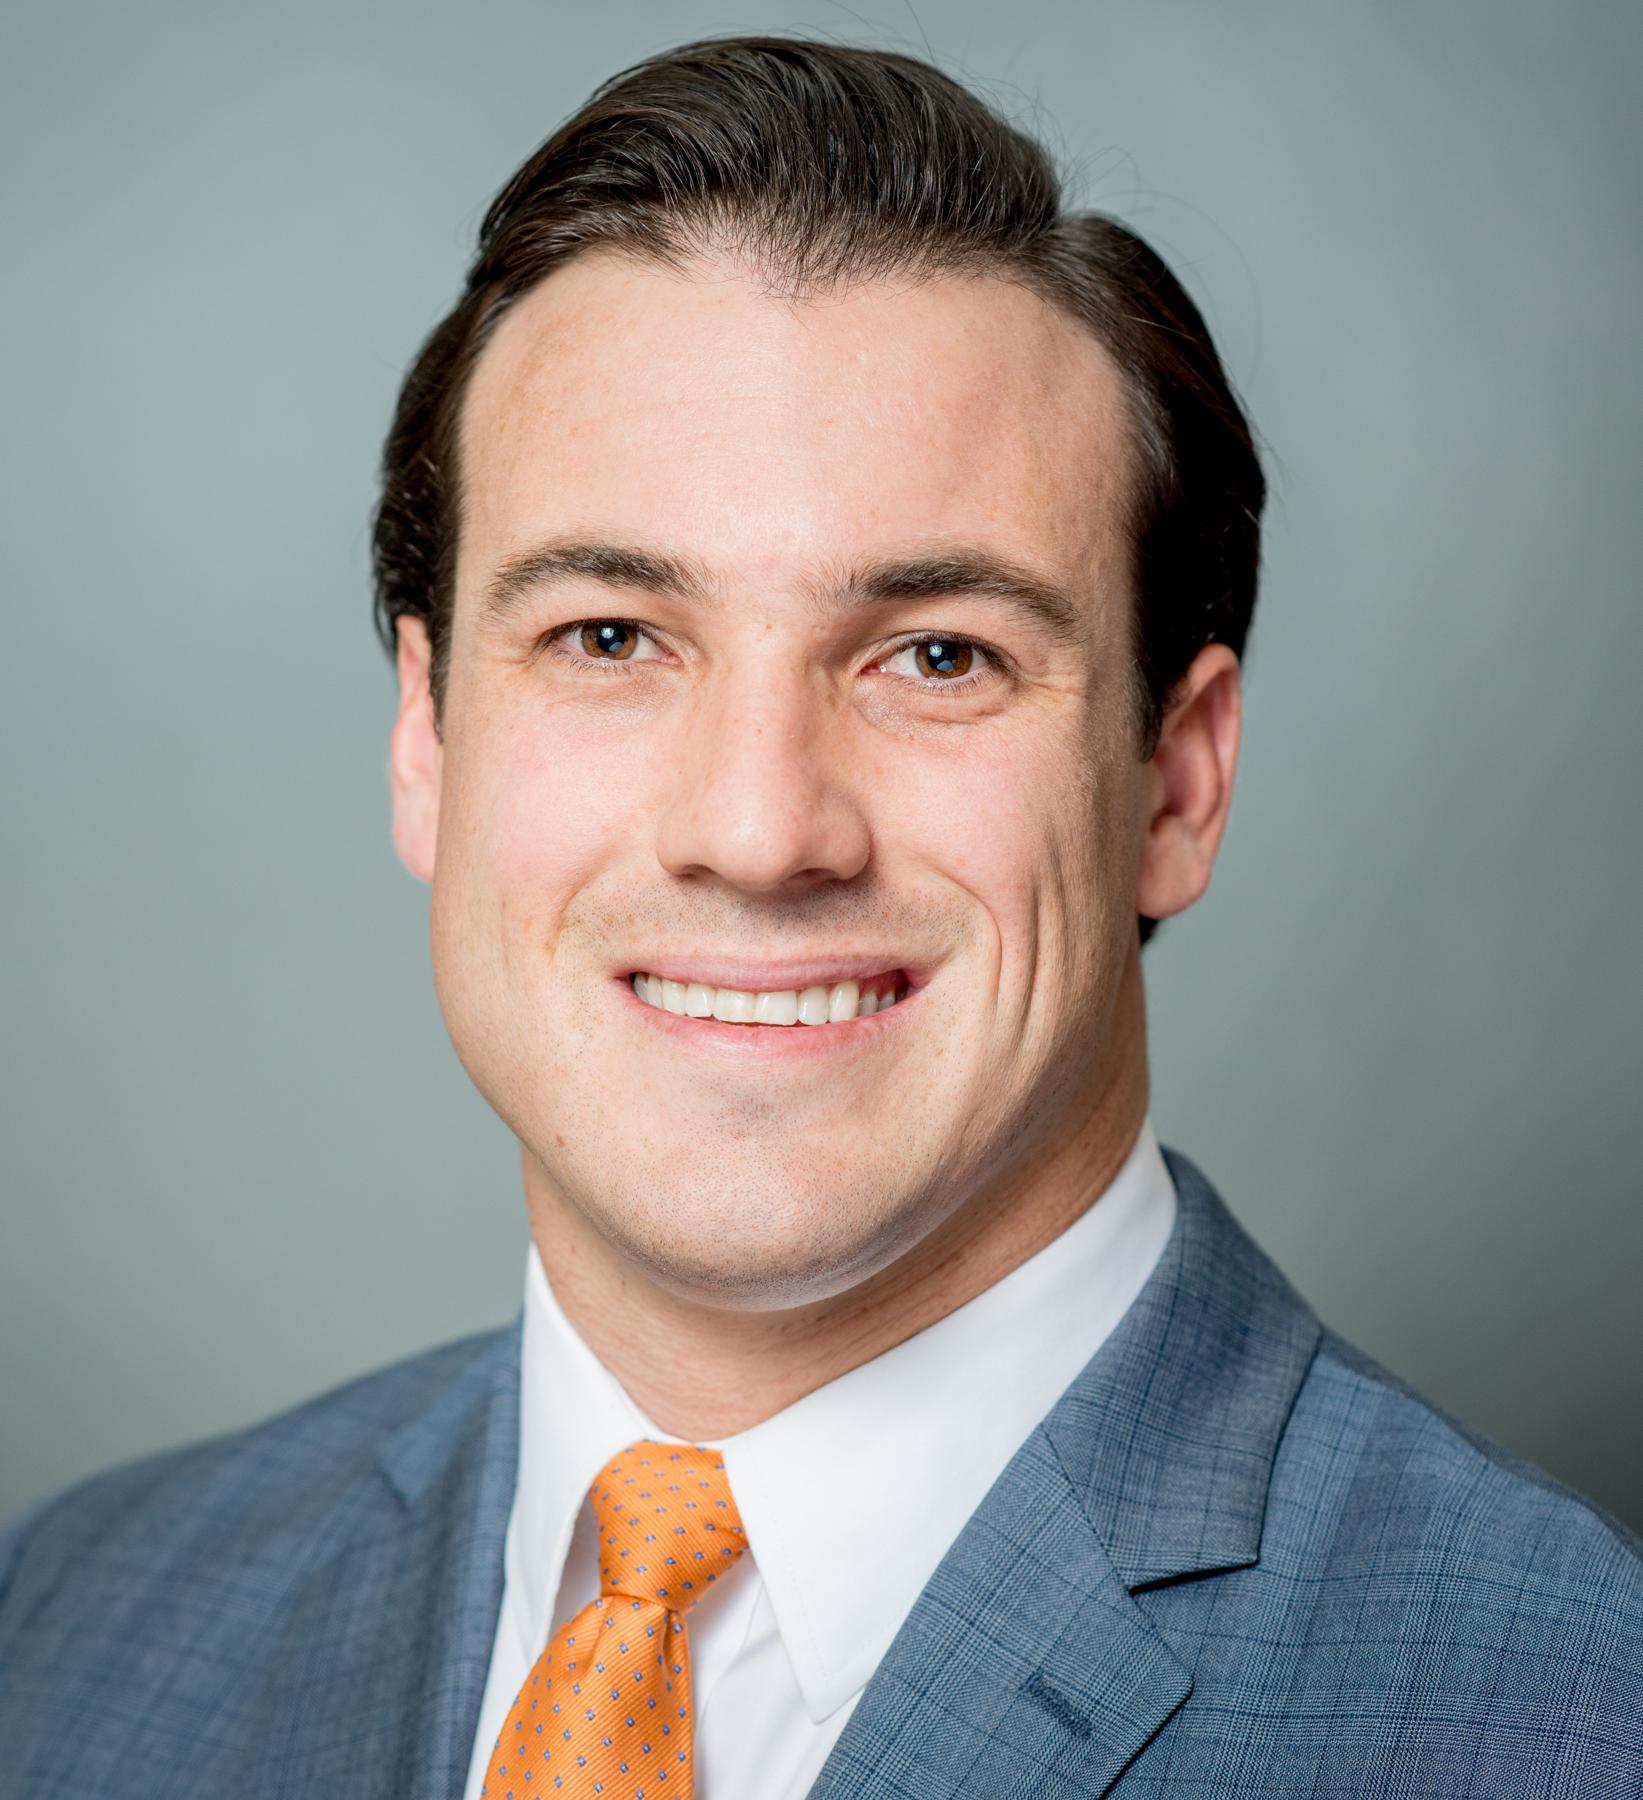 Ryan Creighton Headshot | Dakota Investments